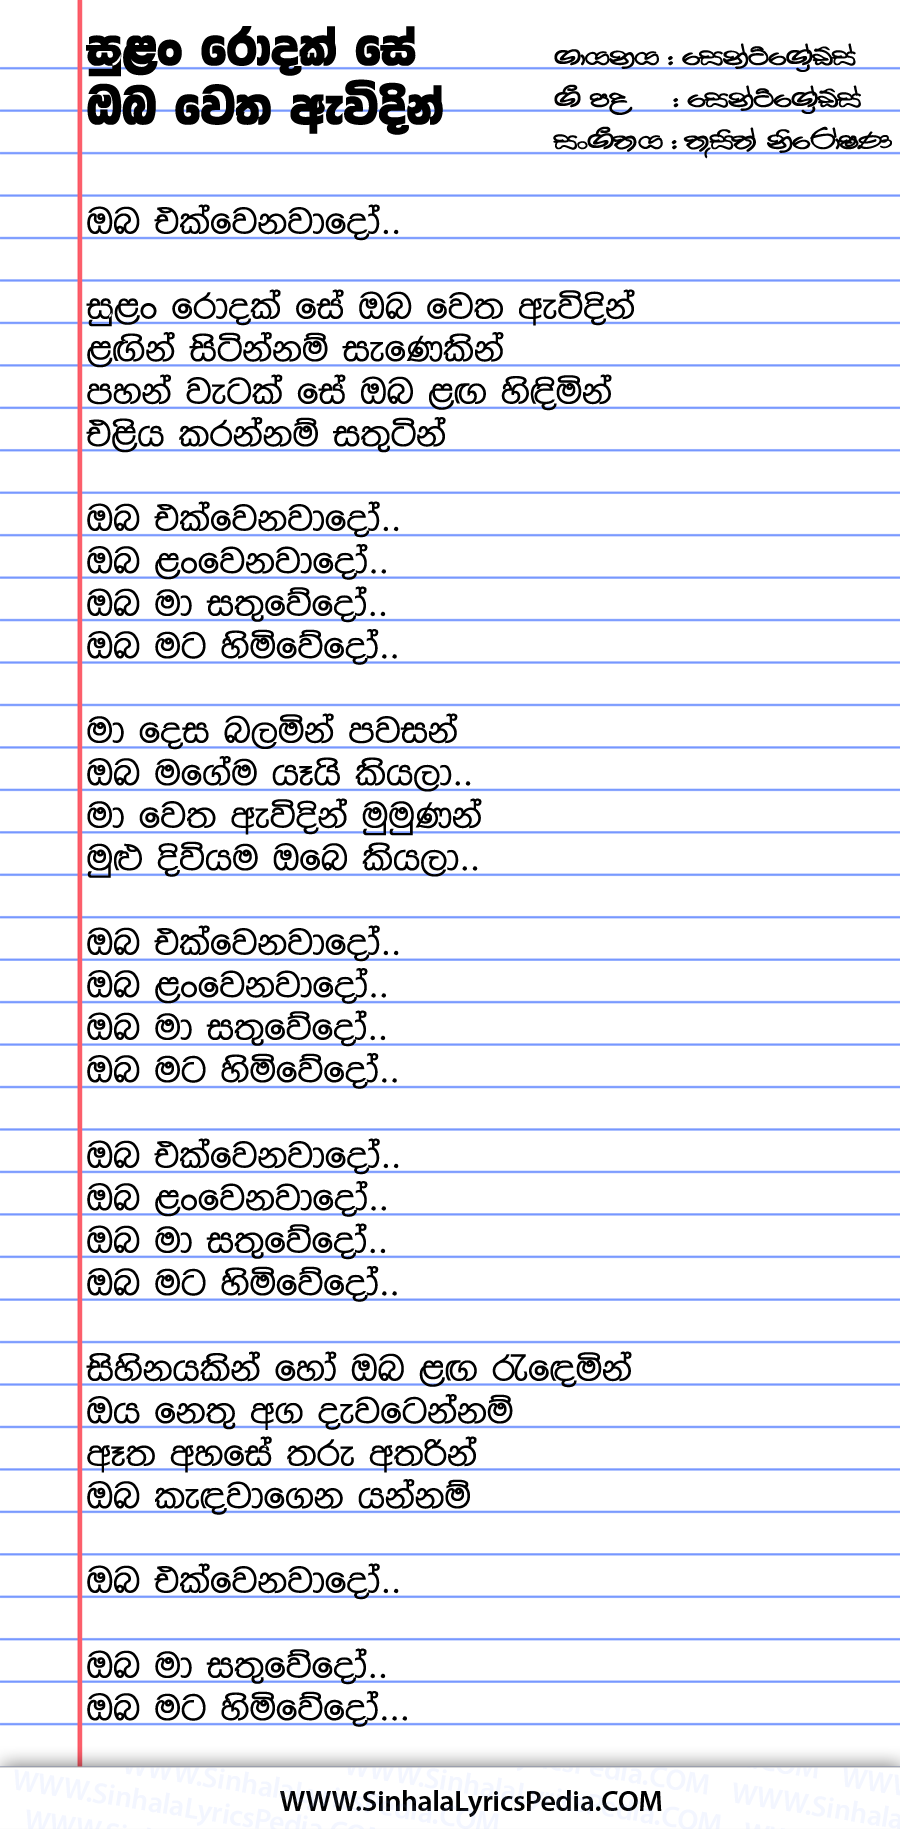 Sulan Rodak Se (Oba Mata Himi Wedo) Song Lyrics